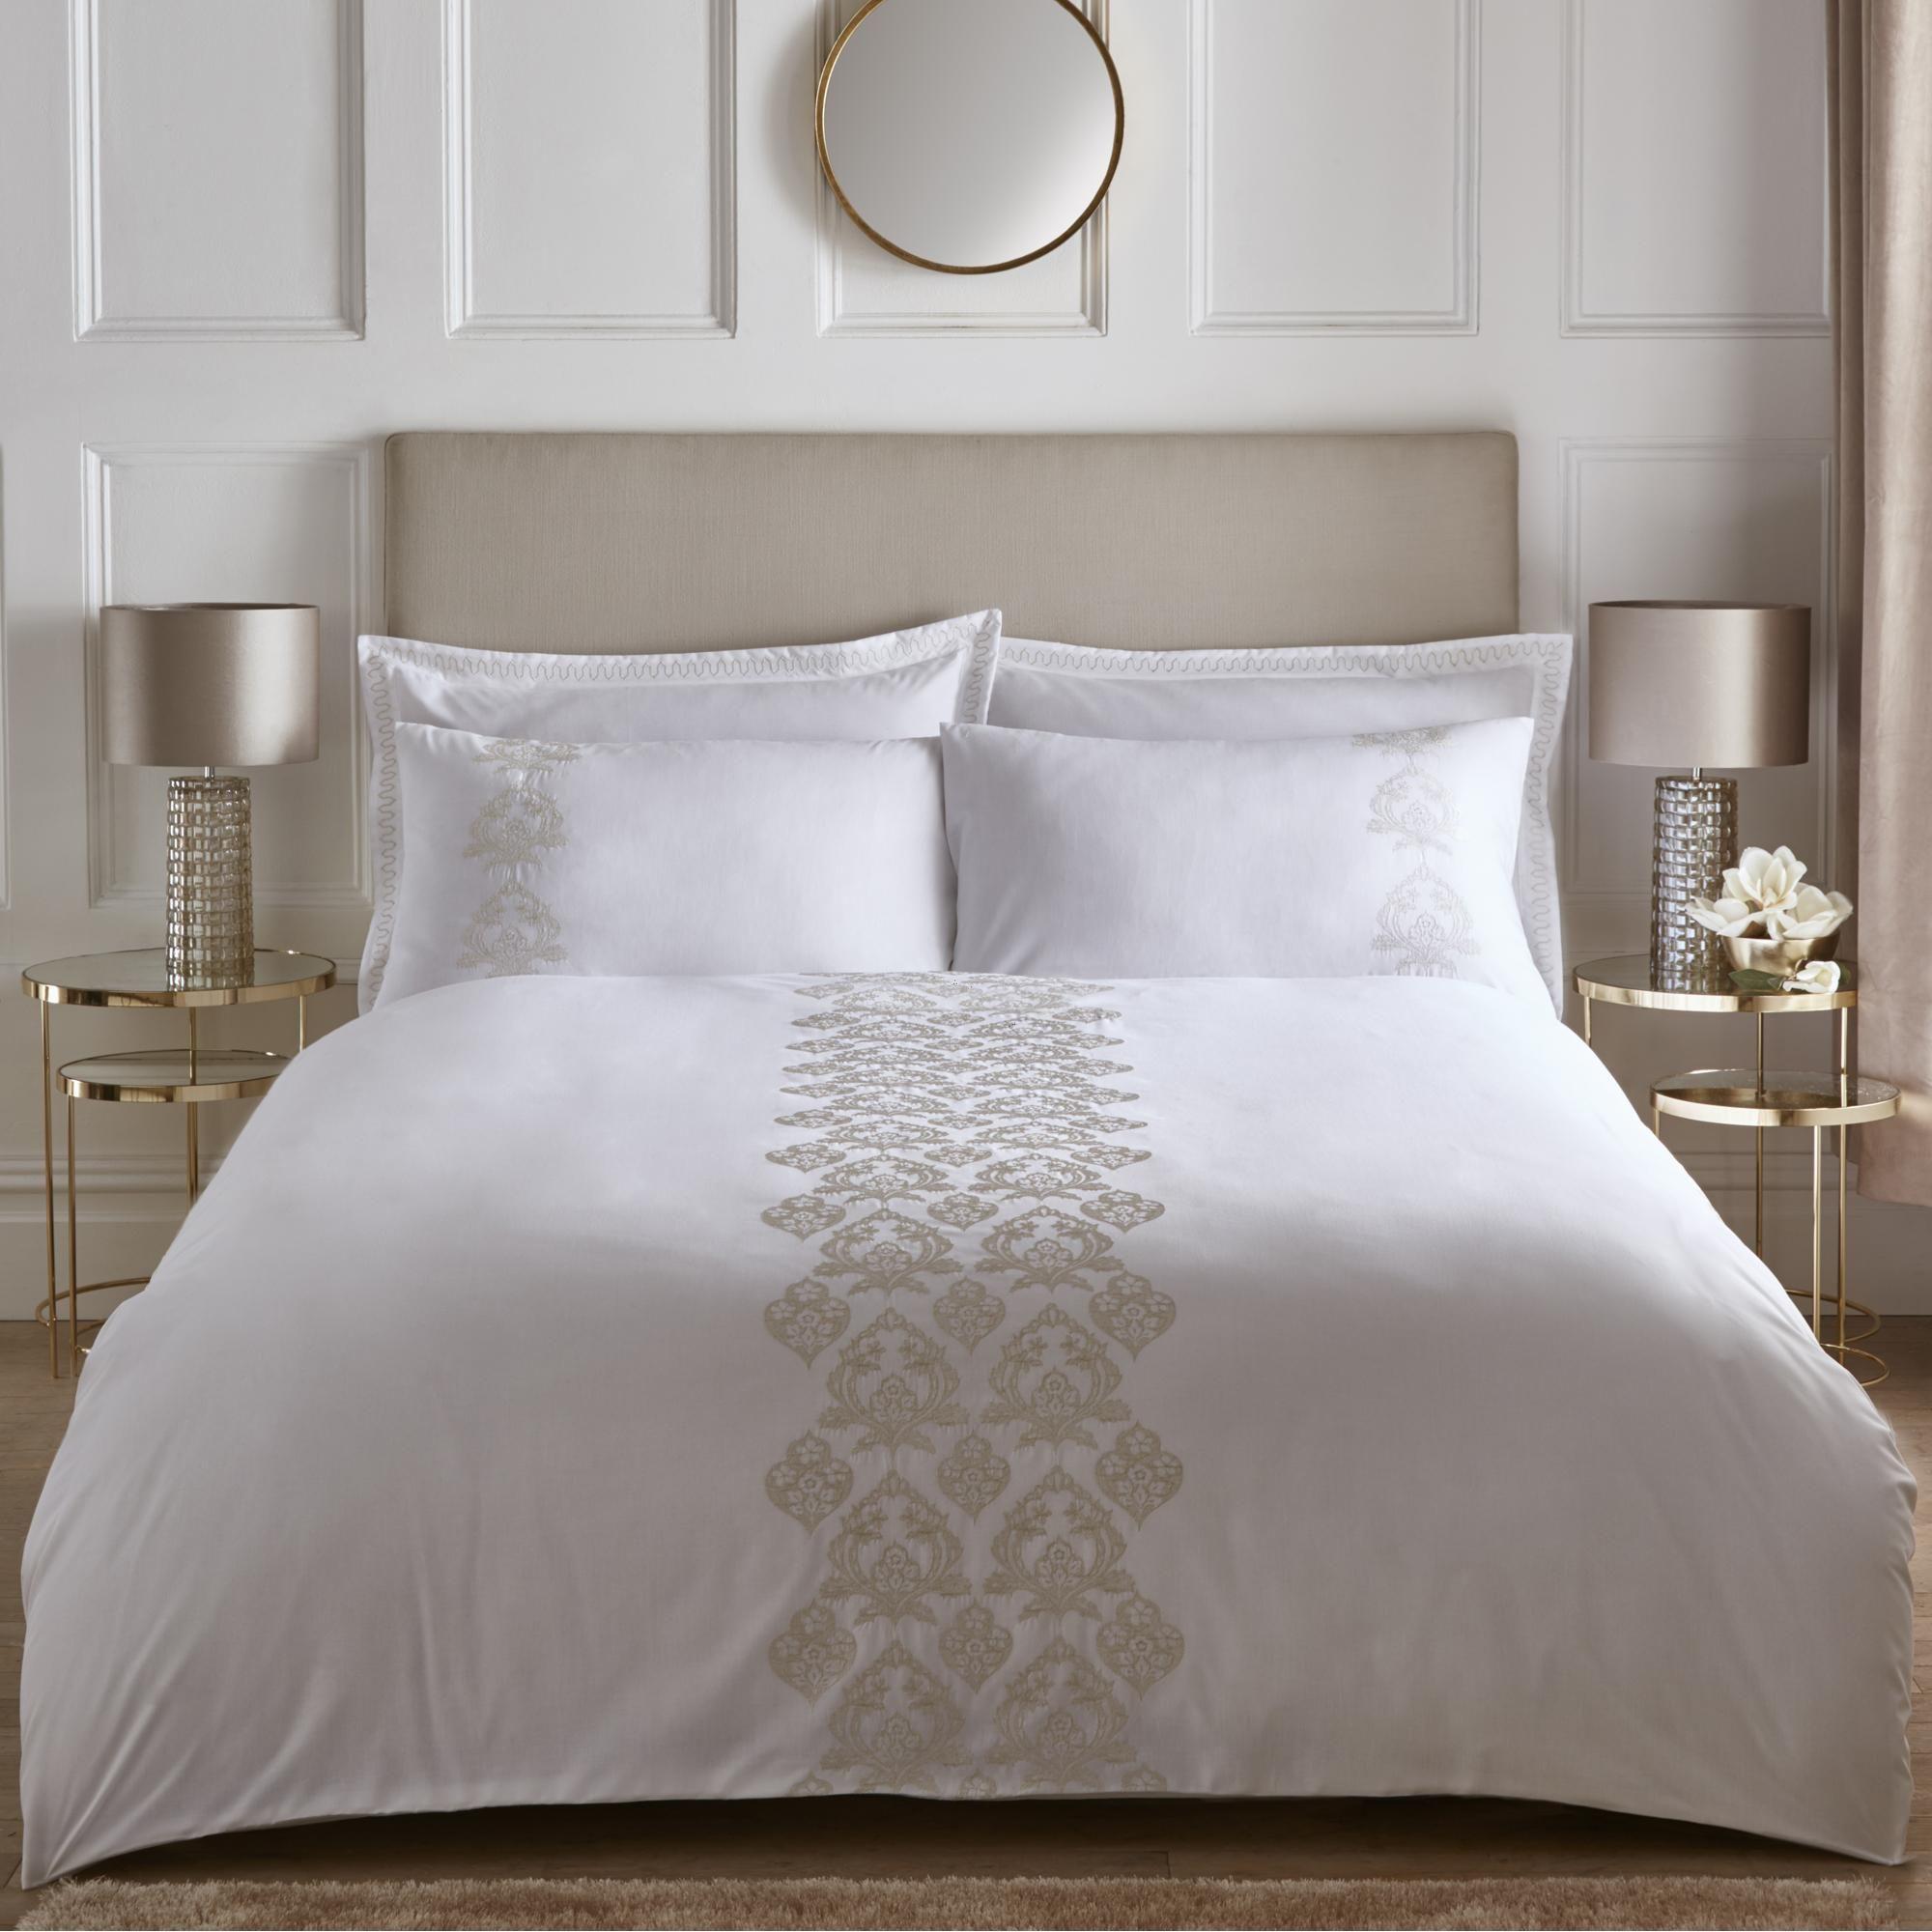 Luxury King size duvet natural white